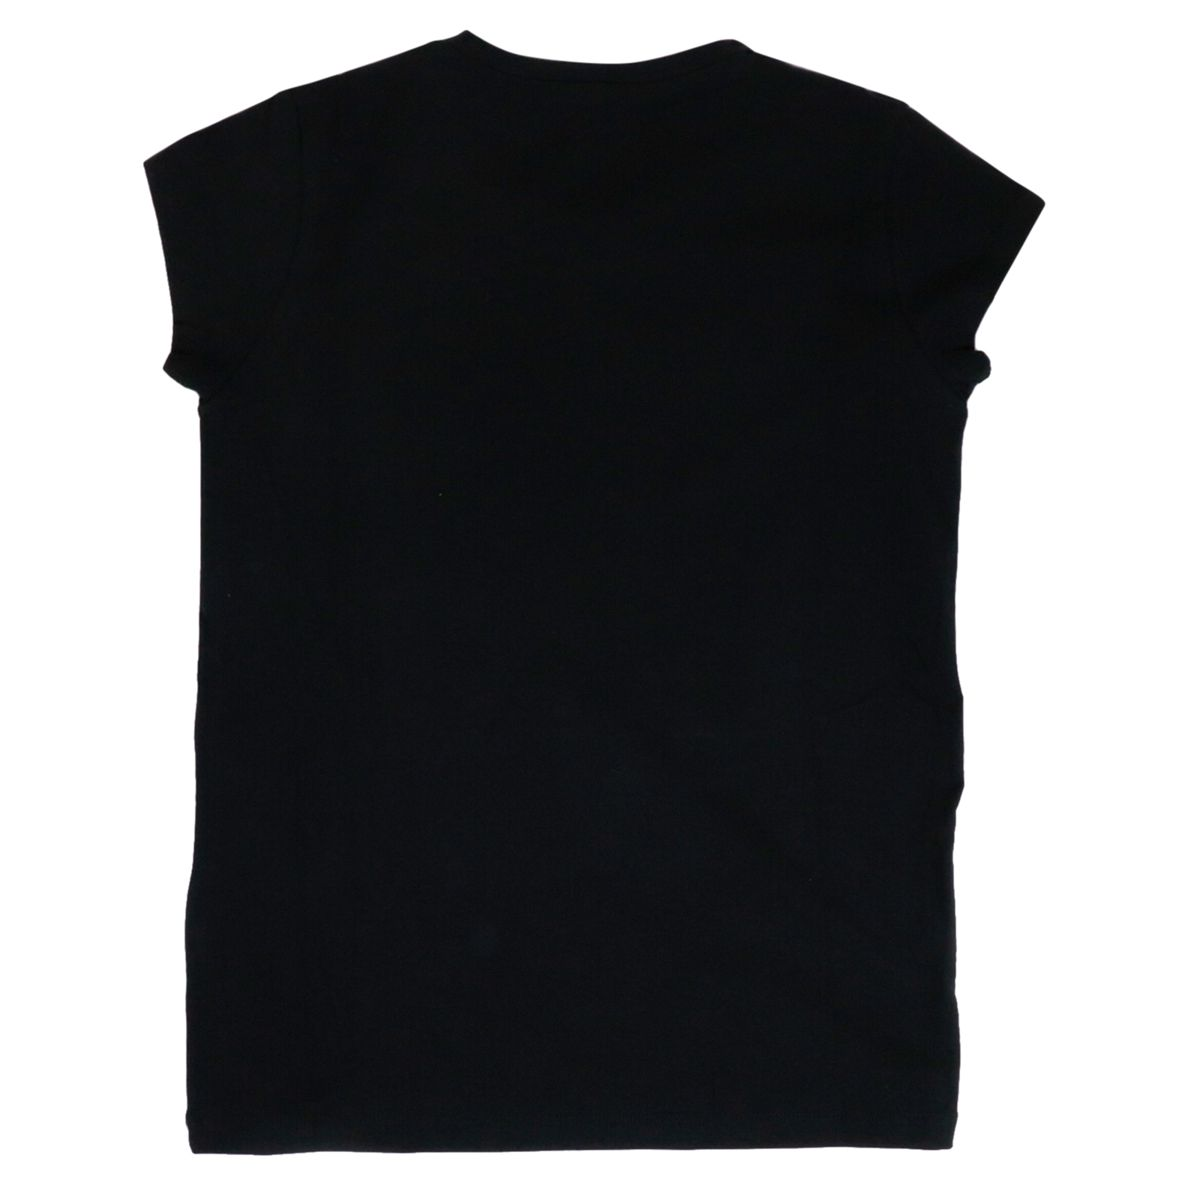 Short-sleeved T-shirt in cotton jersey with rhinestone logo. Black / gold Liu Jo